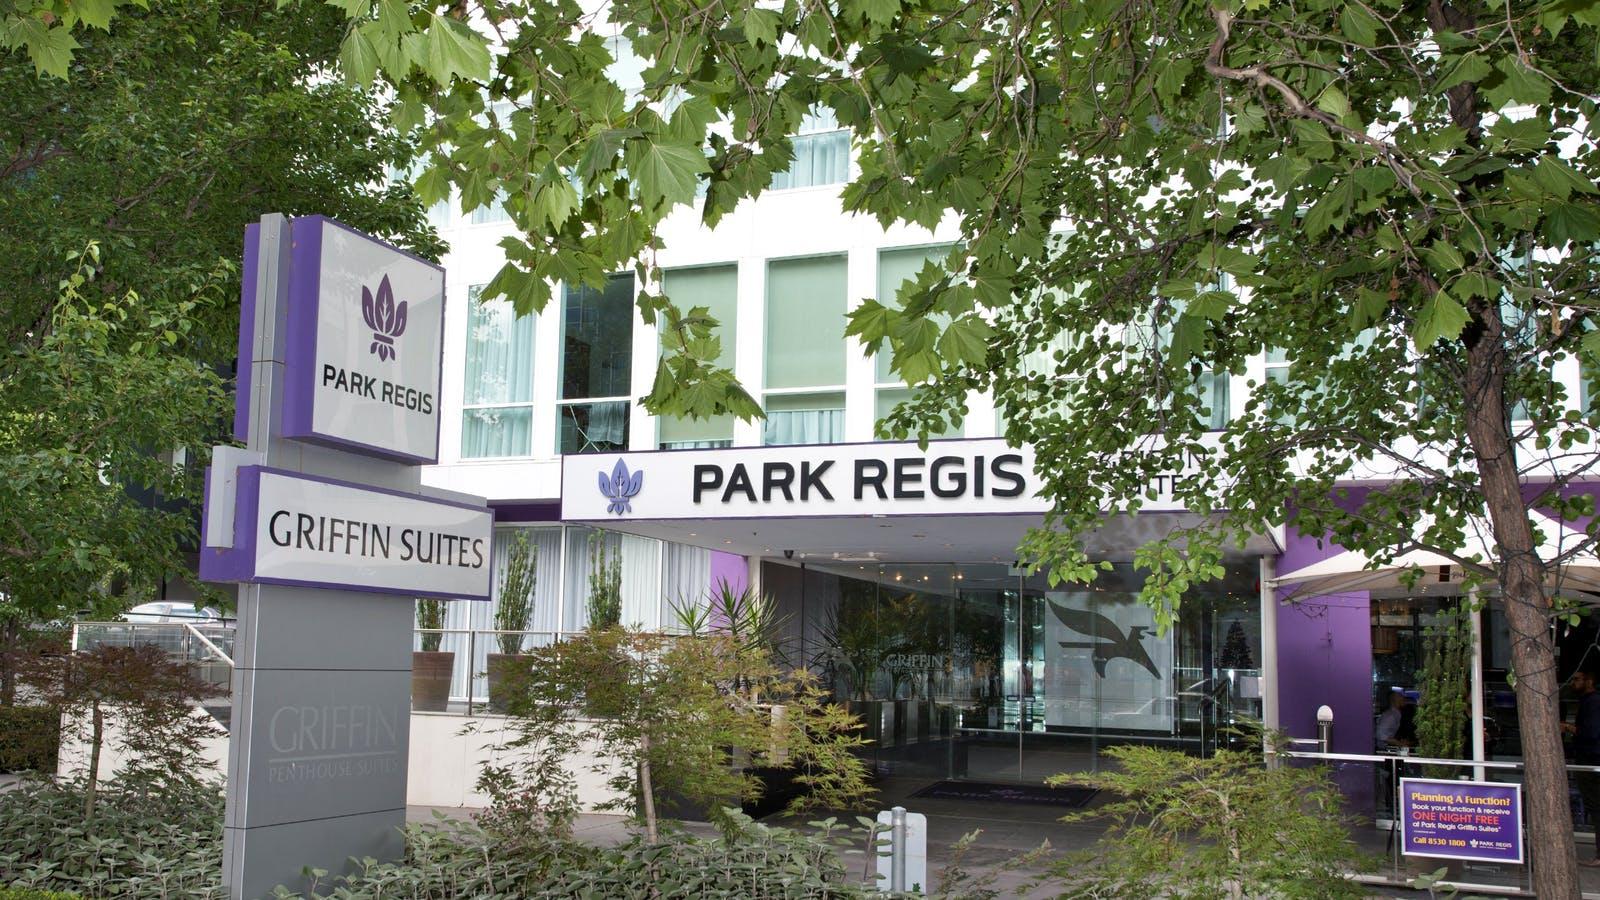 Park Regis Griffin Suites  -front entry on St Kilda Road